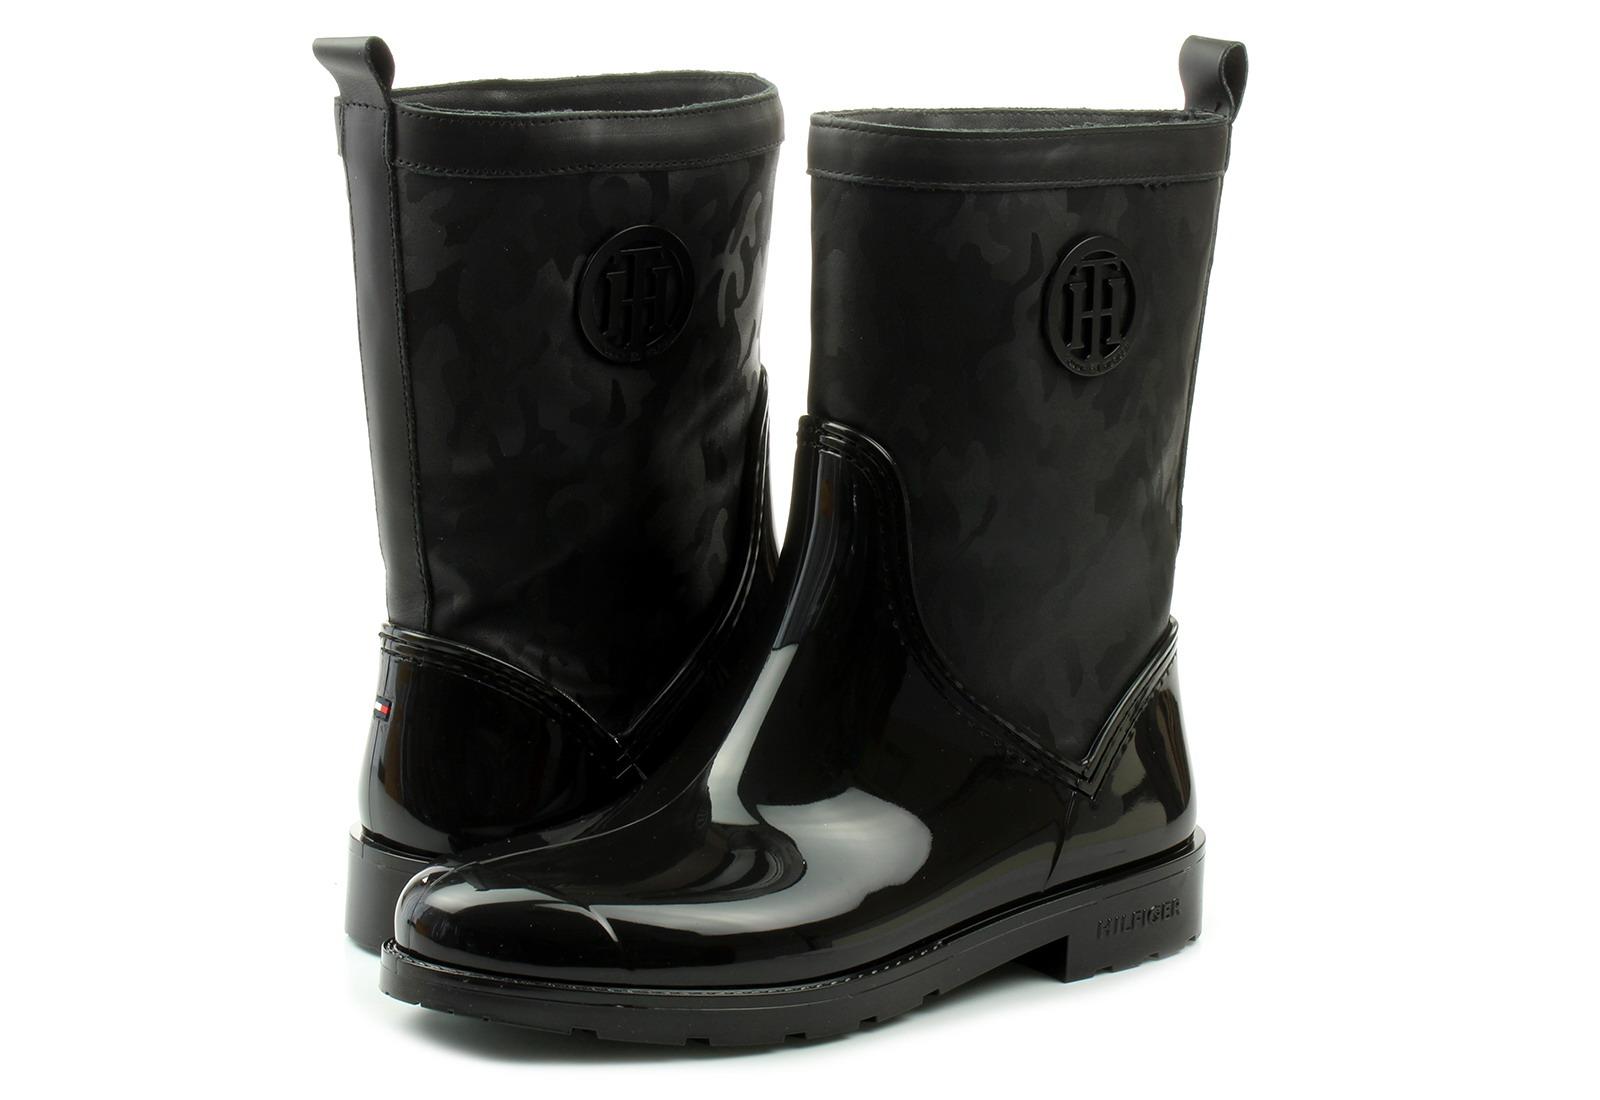 Tommy Hilfiger Csizma - Oxford 27cw - 18F-3318-990 - Office Shoes ... ebbf6ecc05